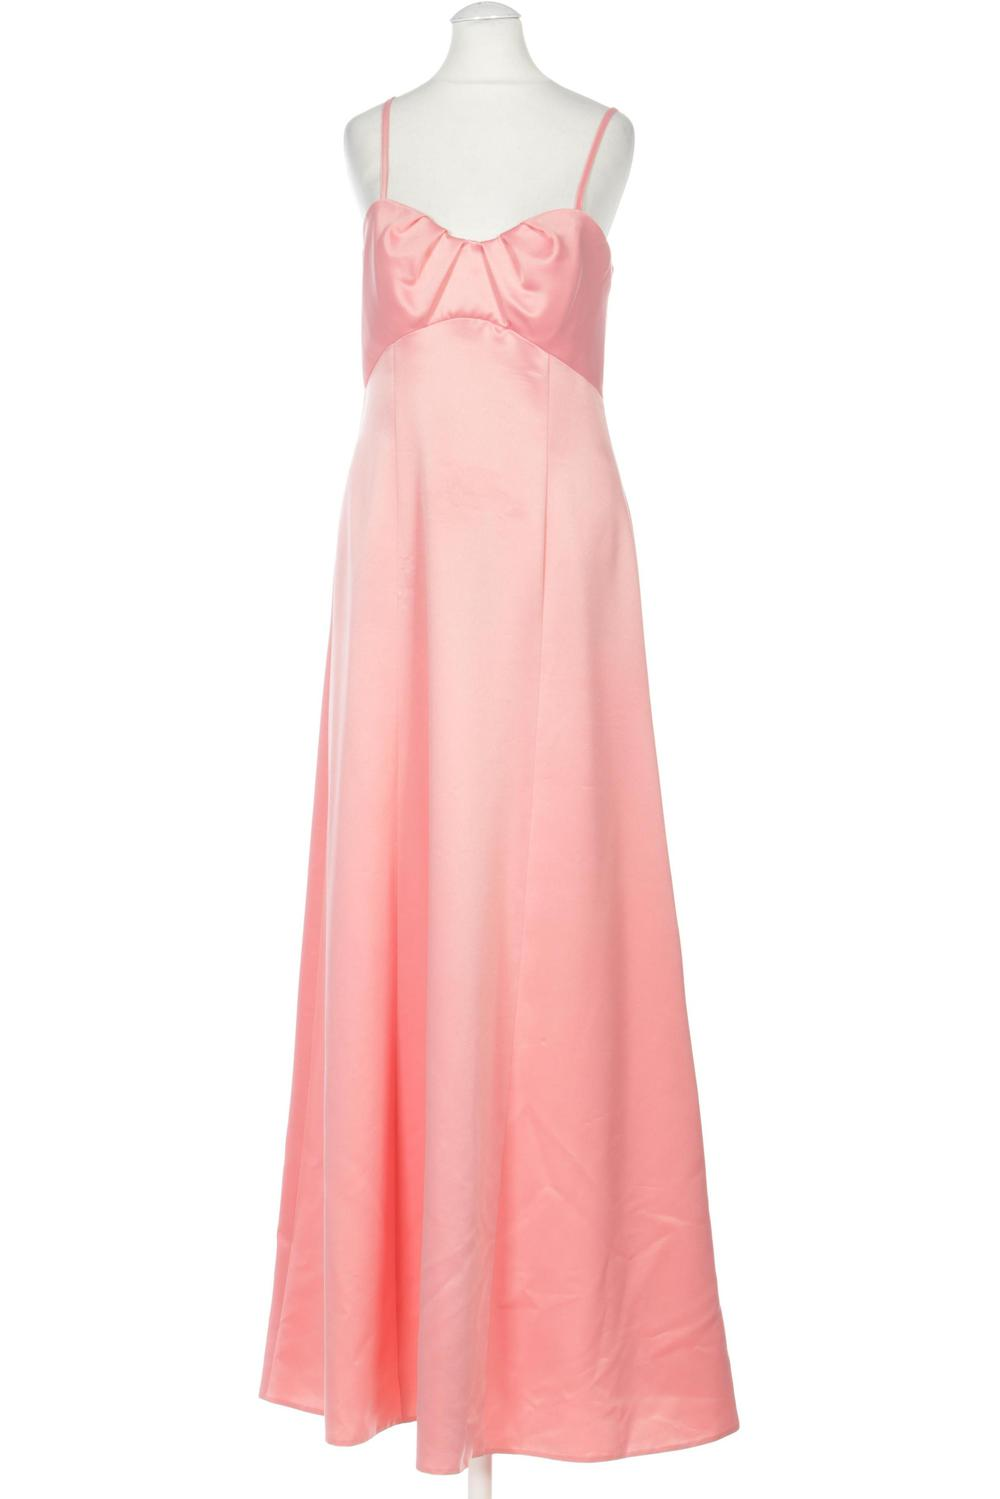 Vera Mont Damen Kleid DE 38 Second Hand kaufen | ubup